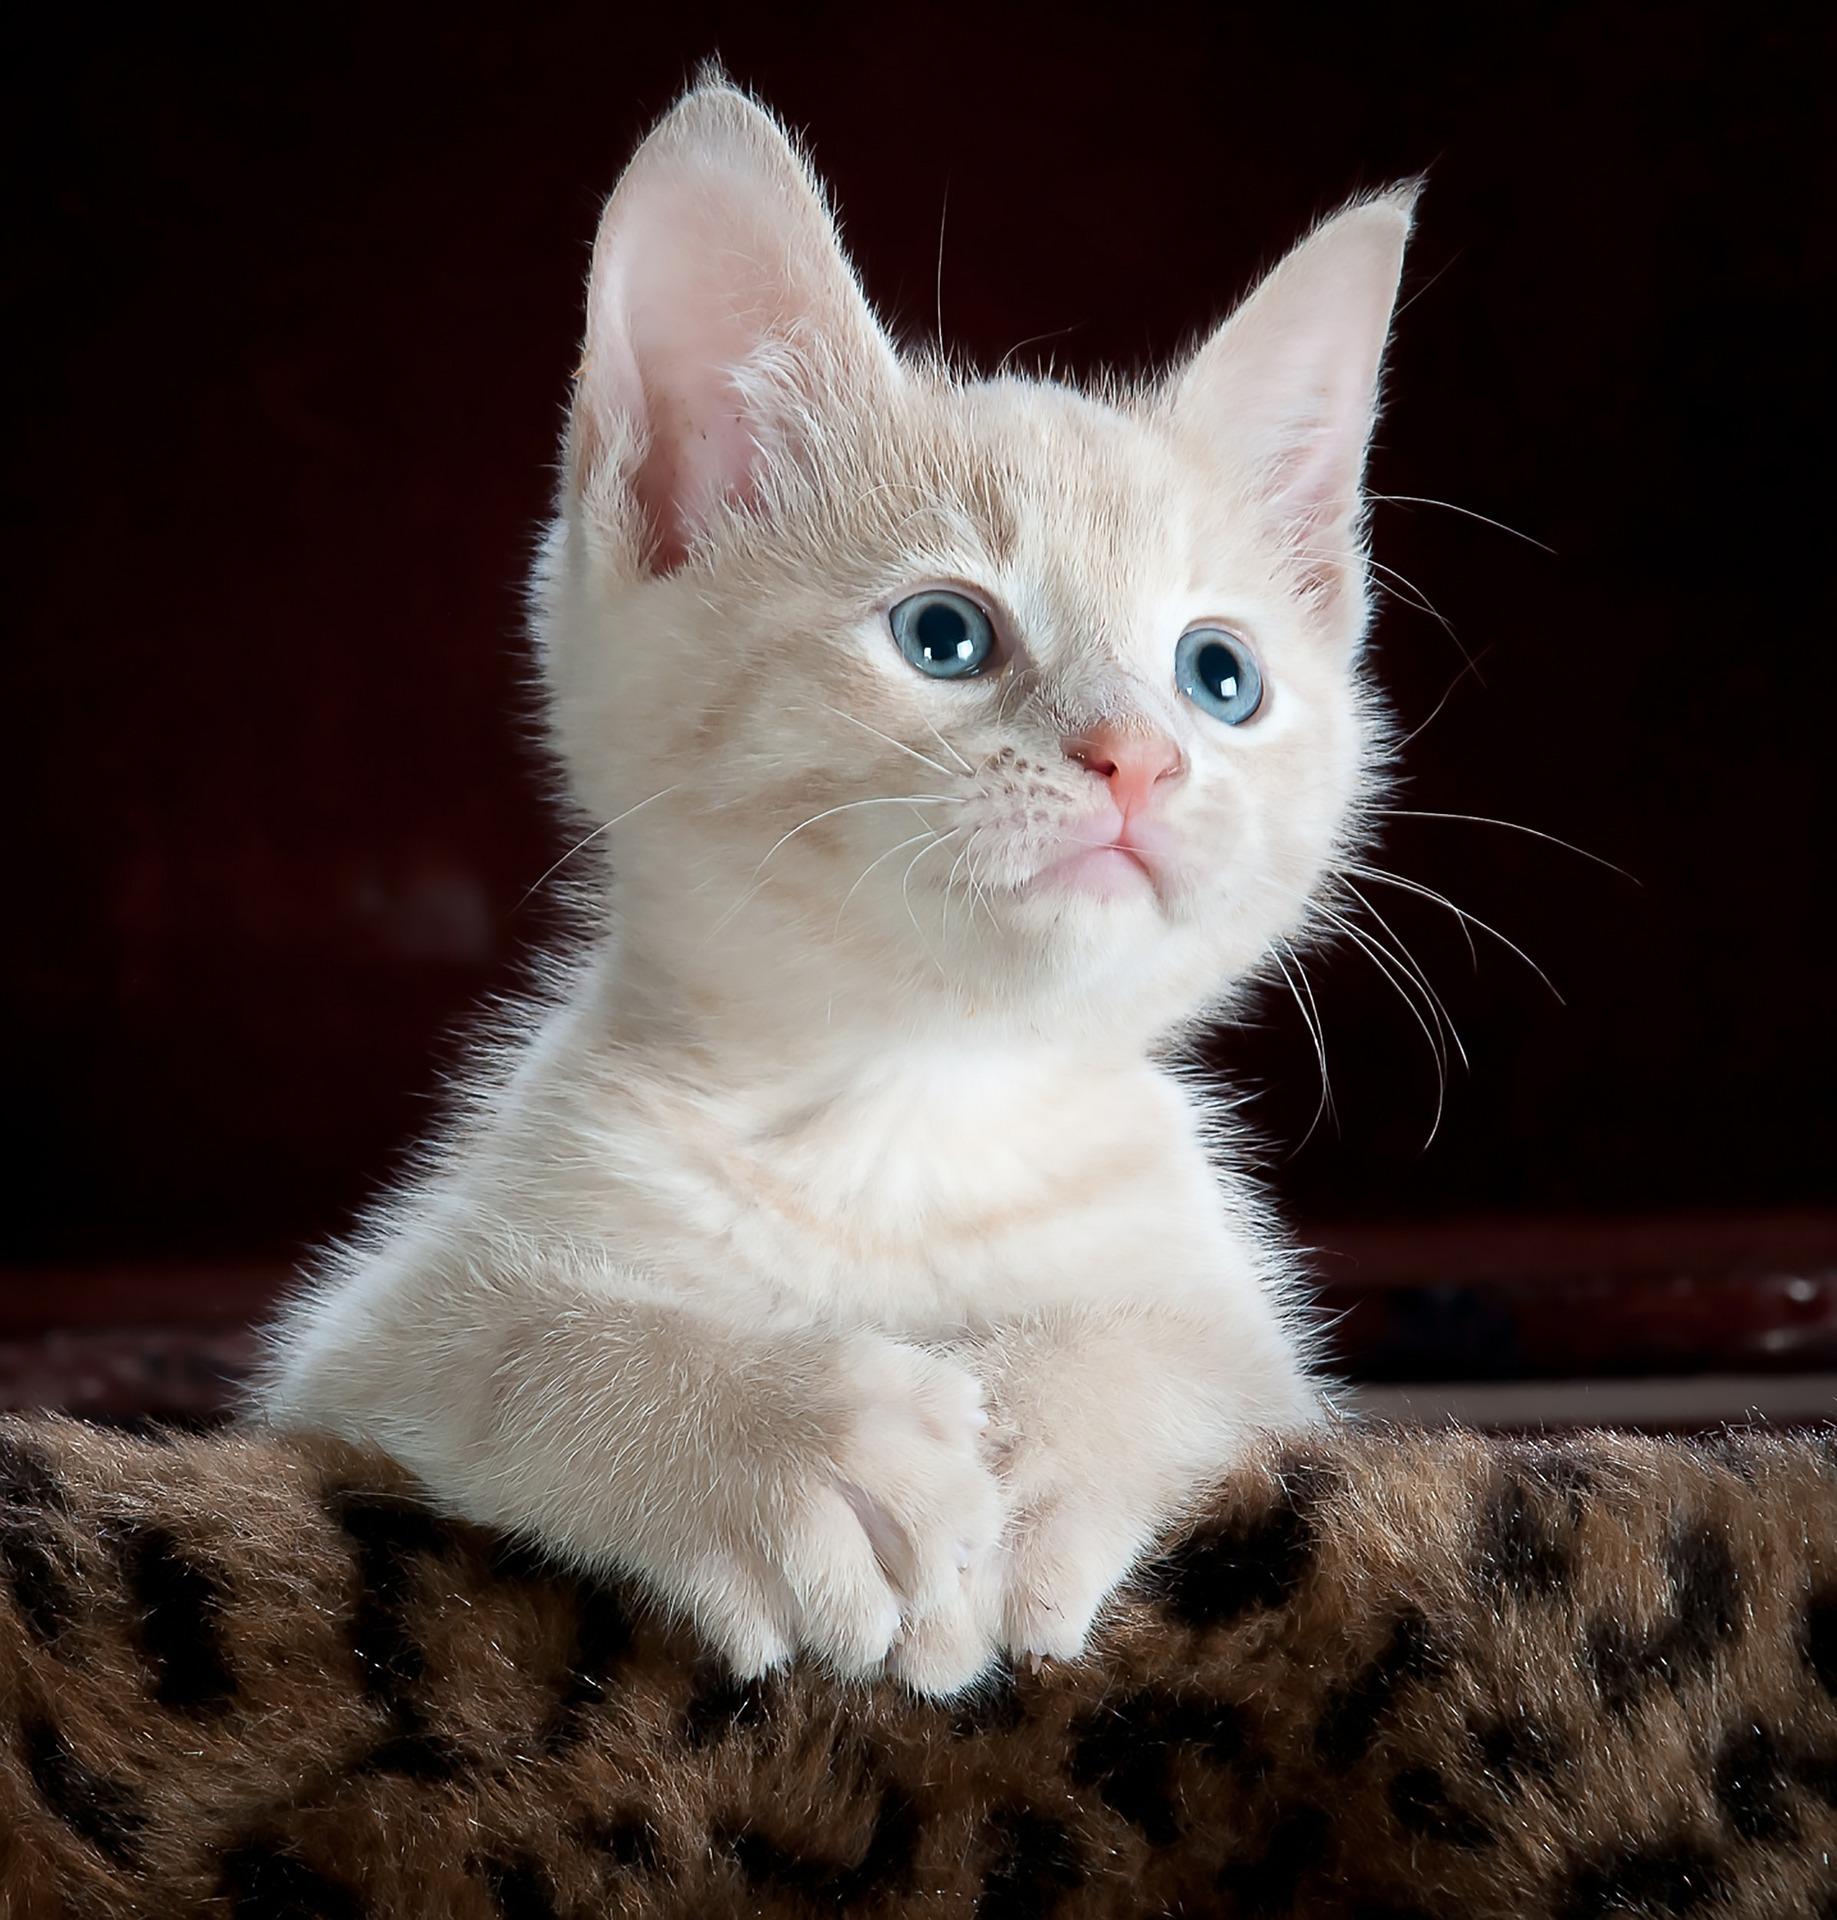 Adorable Blue Eyed Kitten